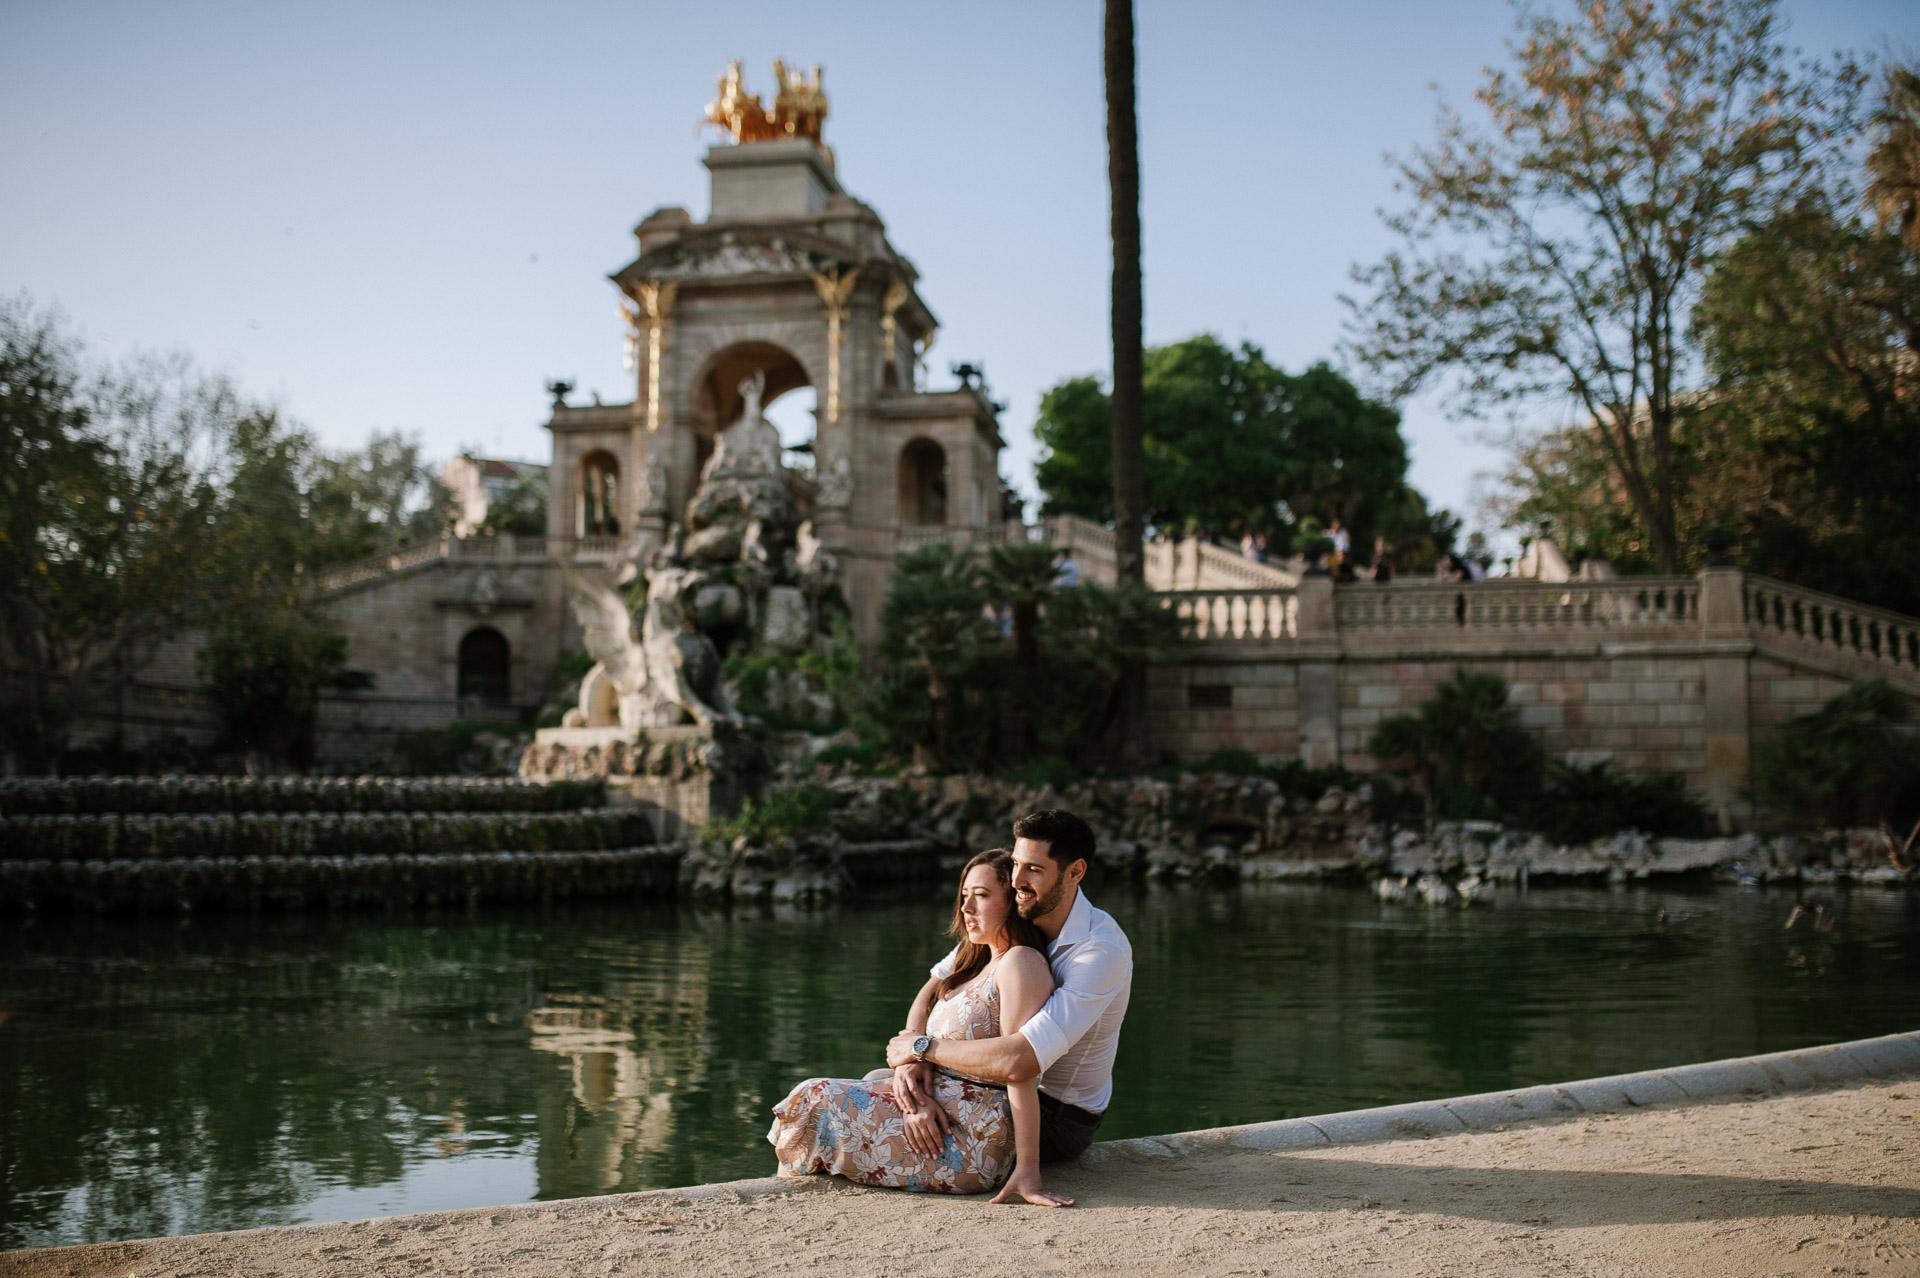 MoiraAlbert-mamaphoto-engagementsession-barcelona-43.jpg